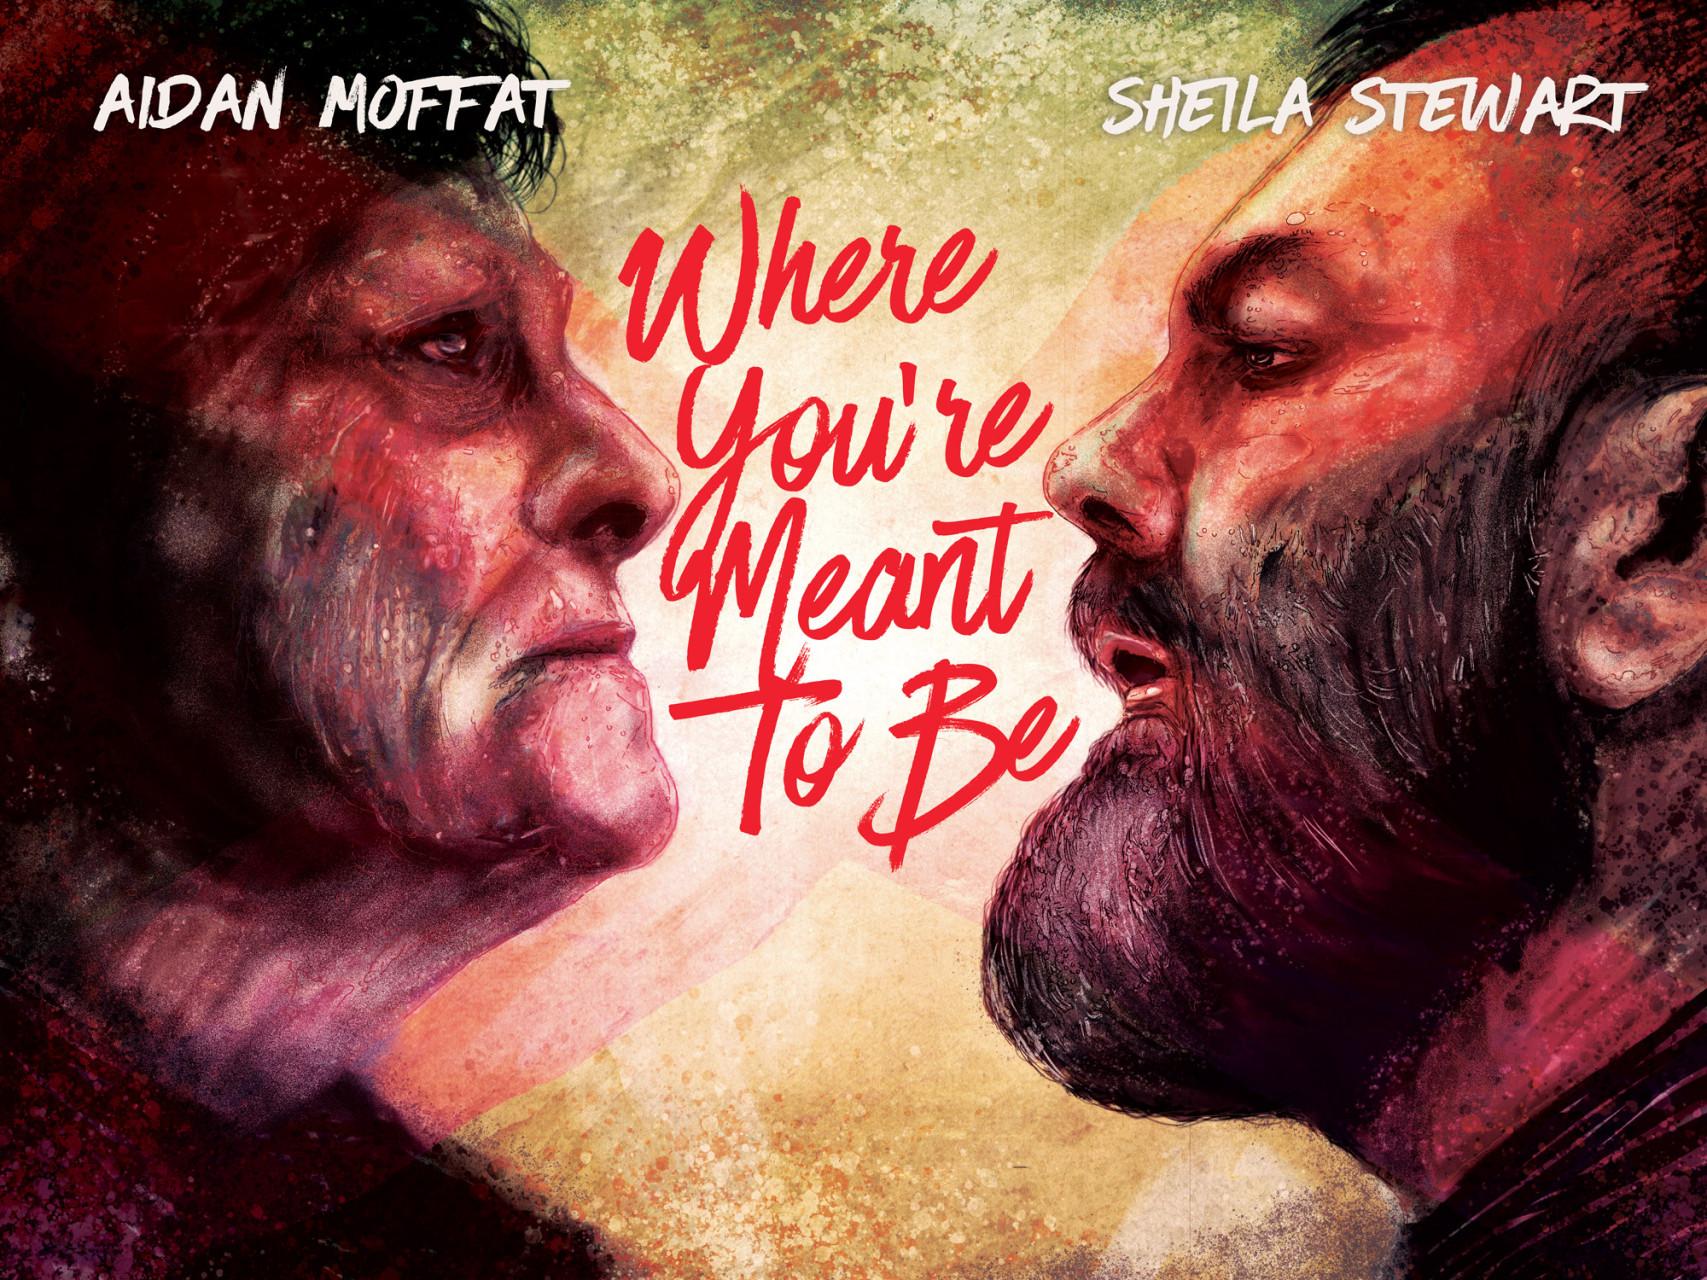 Scottish feature film starring folk singers Aidan Moffat and Sheila Stewart